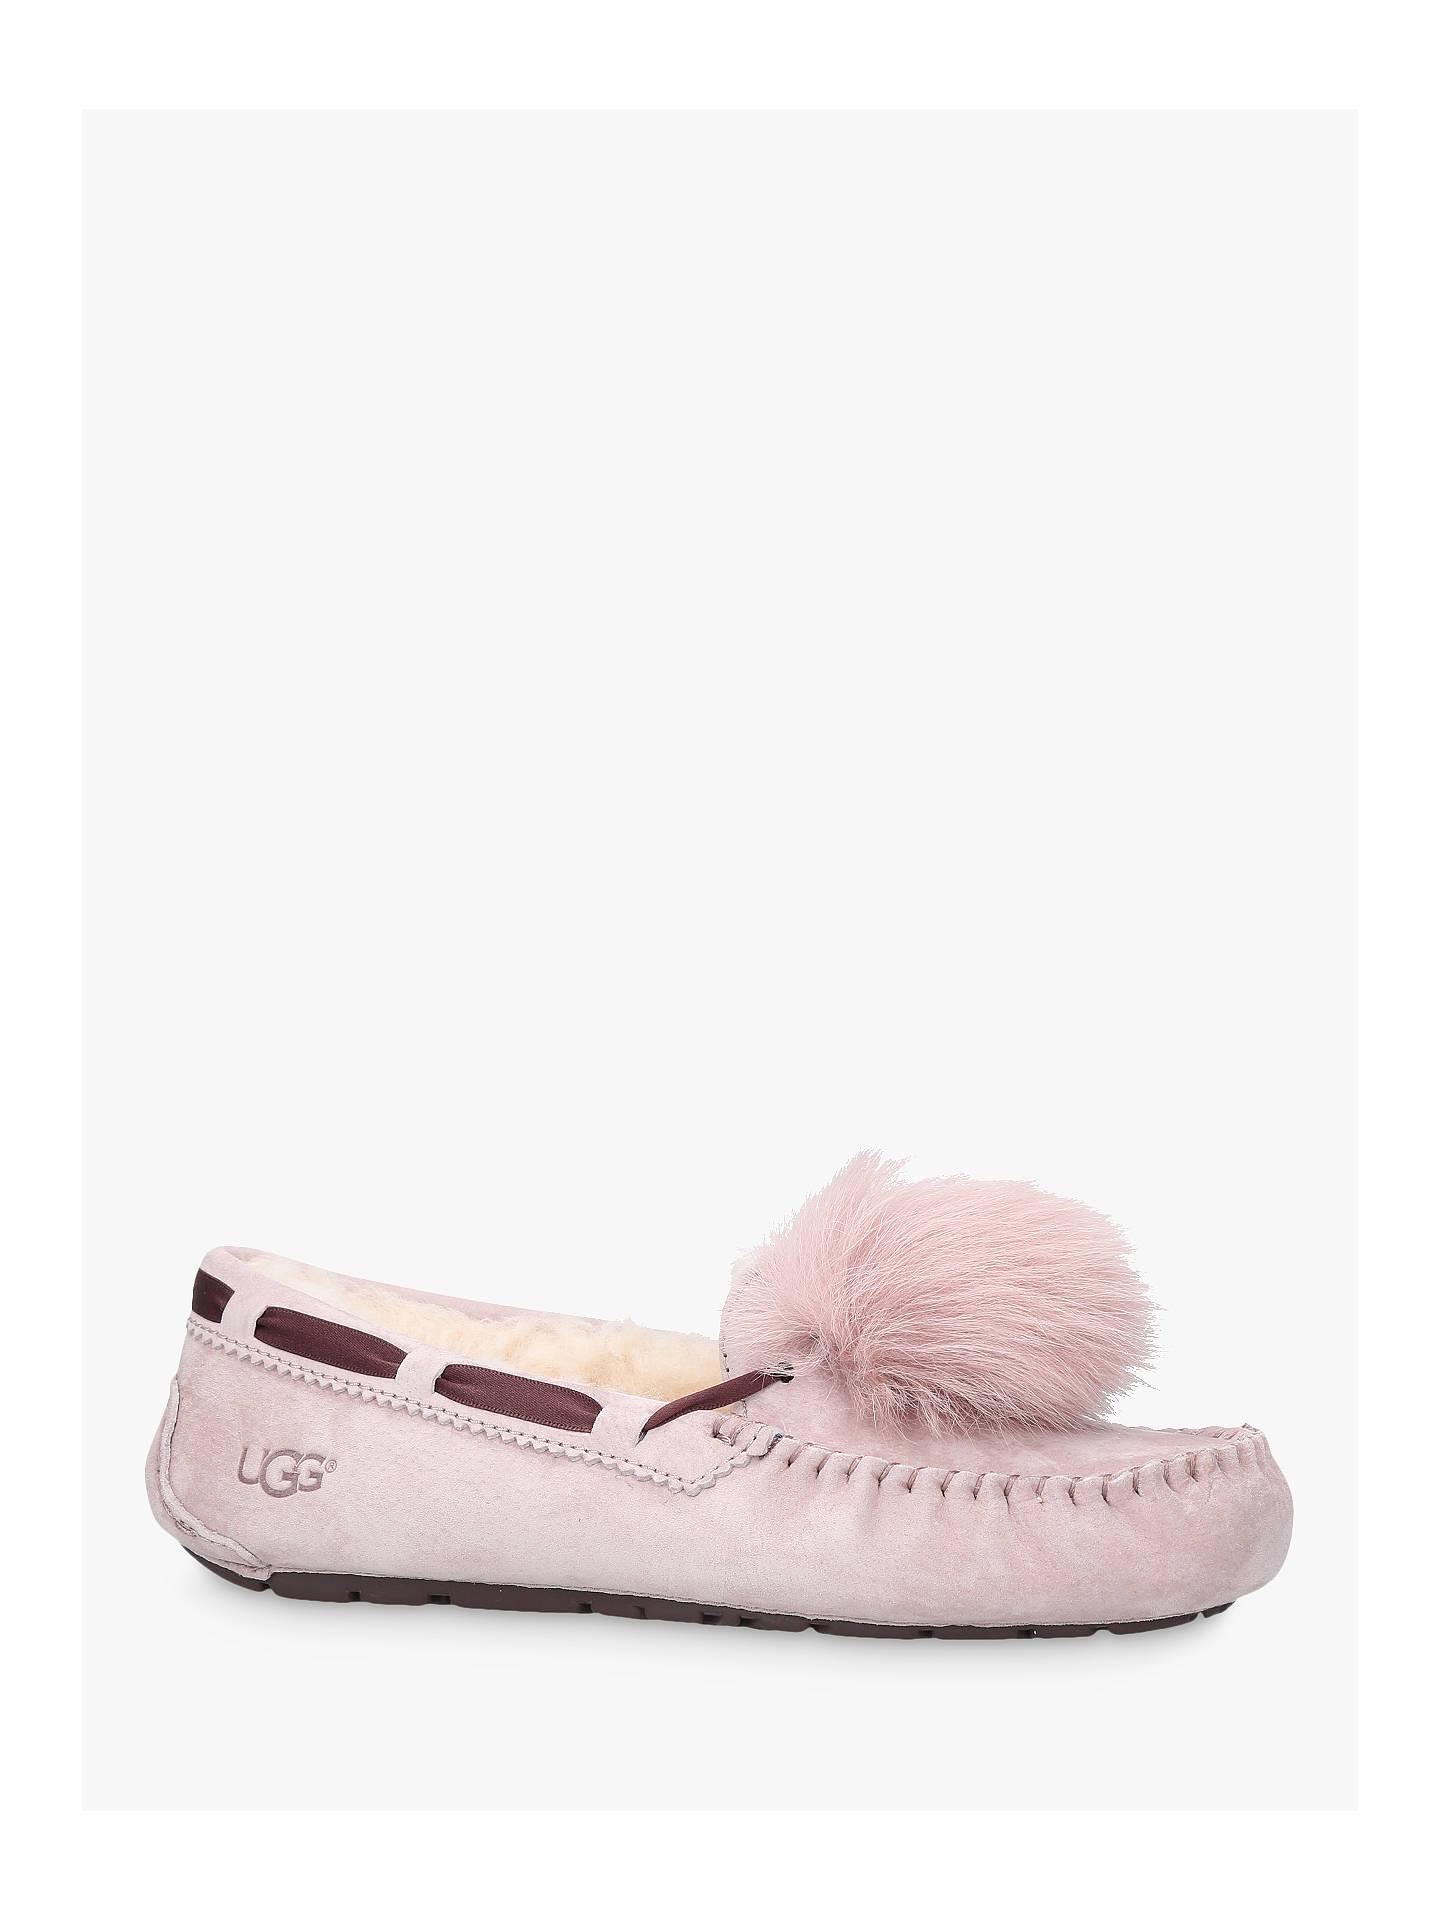 BuyUGG Dakota Moccasin Pom Sheepskin Slippers, Pale Pink, 3 Online at johnlewis.com ...